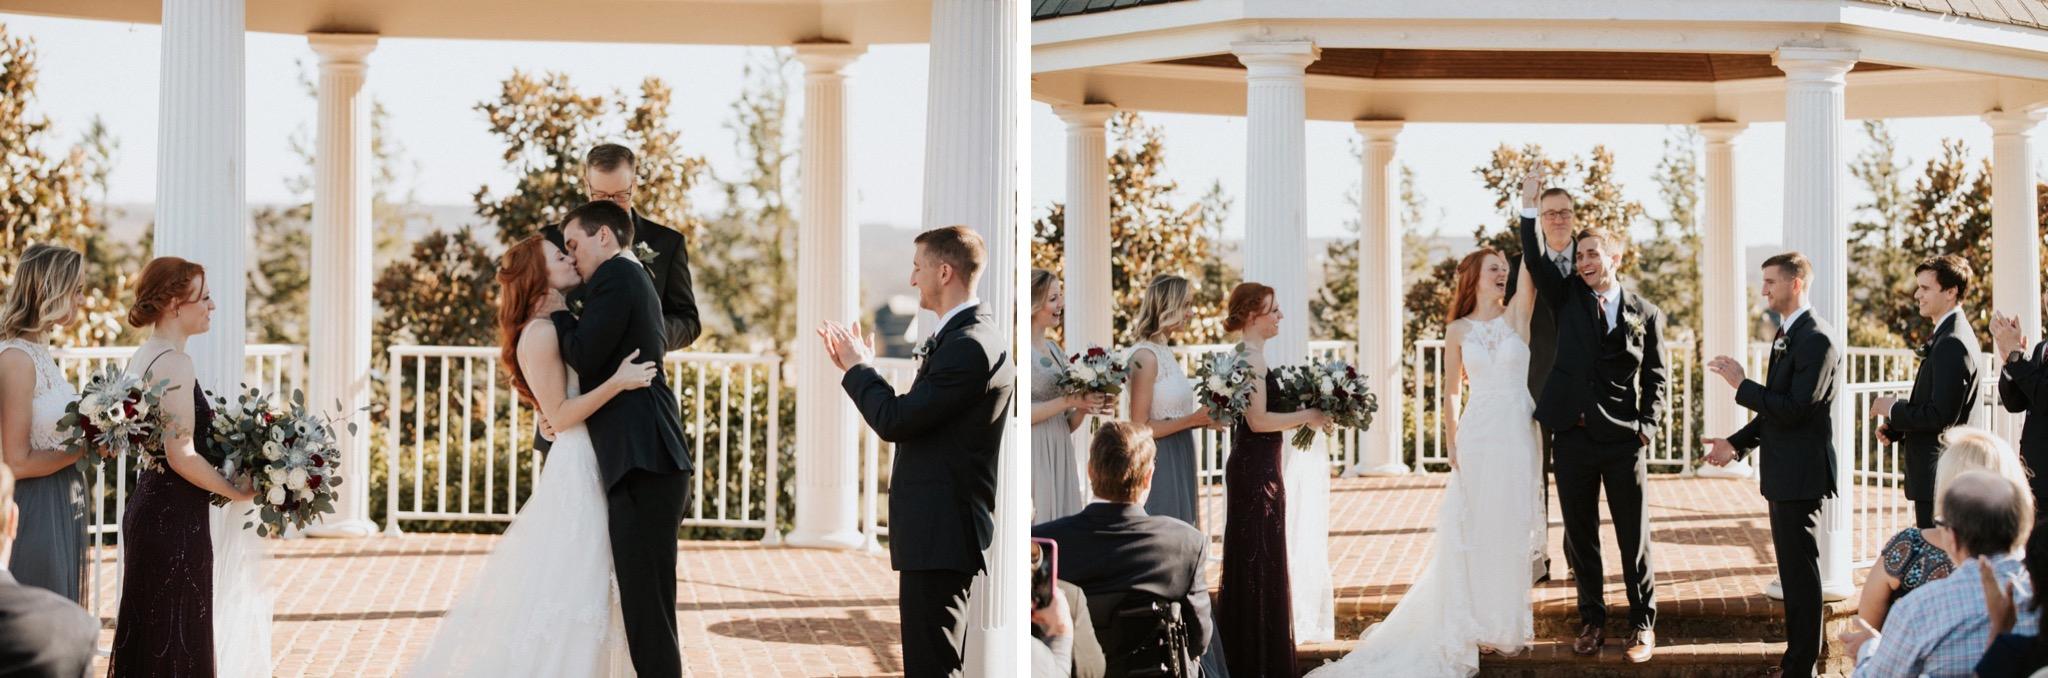 51_West Manor Estate Weddings - Pat Cori Photography-105_West Manor Estate Weddings - Pat Cori Photography-107_Ceremony_PatCoriPhotography_VirginiaWeddingPhotographer_WestManorEstate_Wedding.jpg